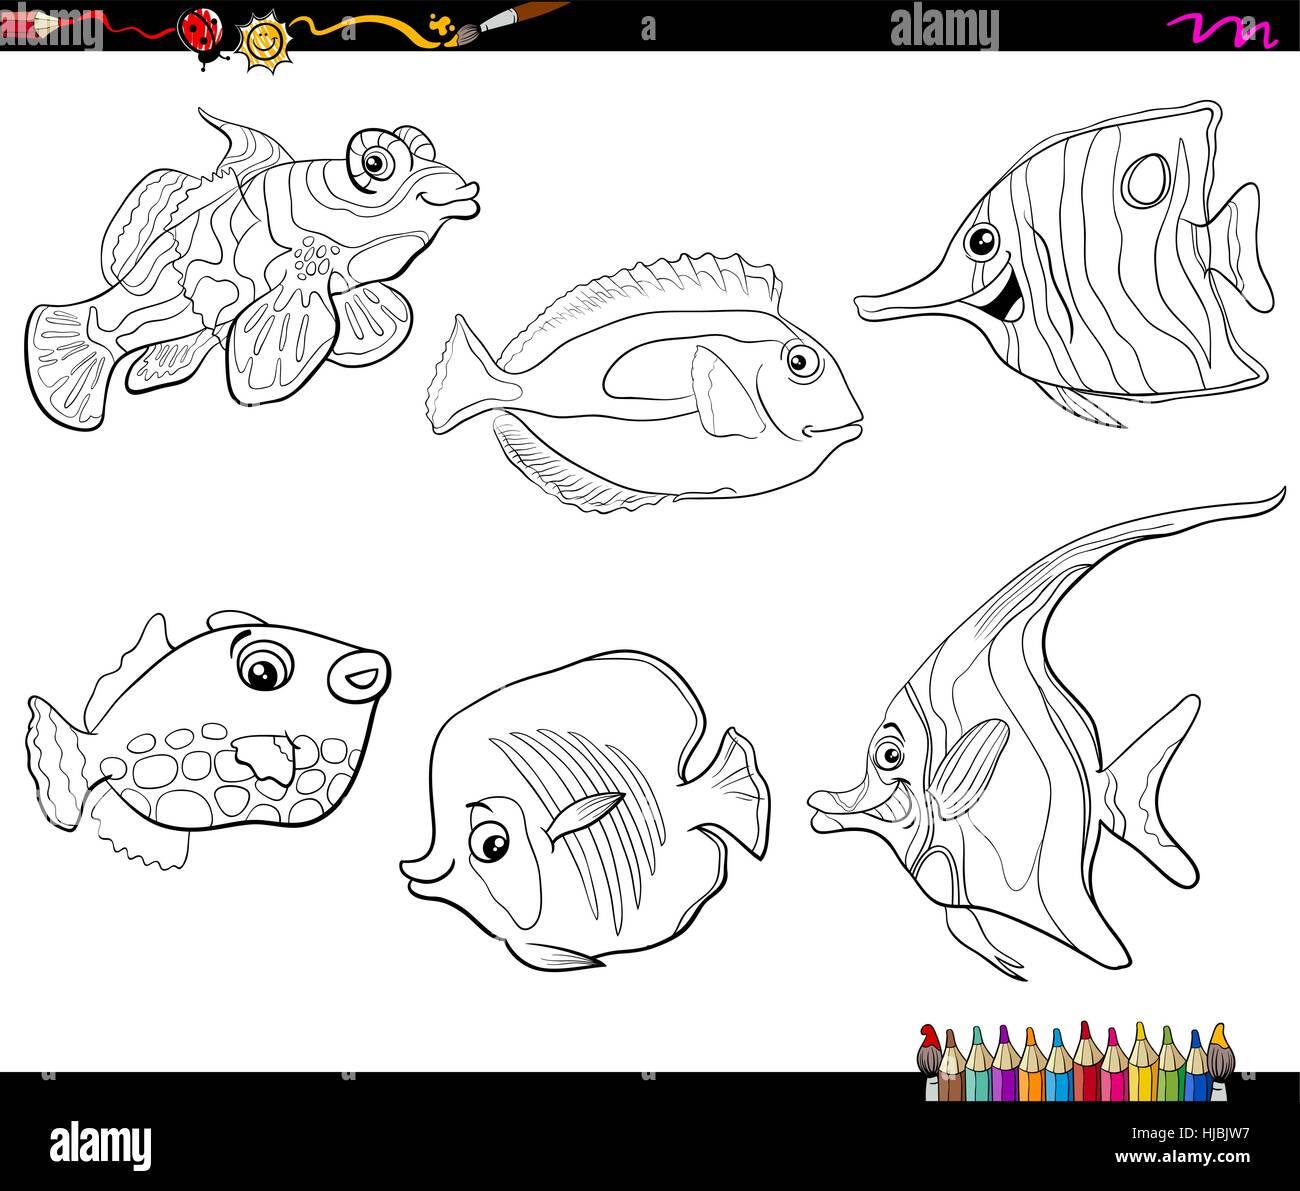 Black And White Cartoon Illustration Of Tropical Fish Sea Life Animal Stock Vector Art